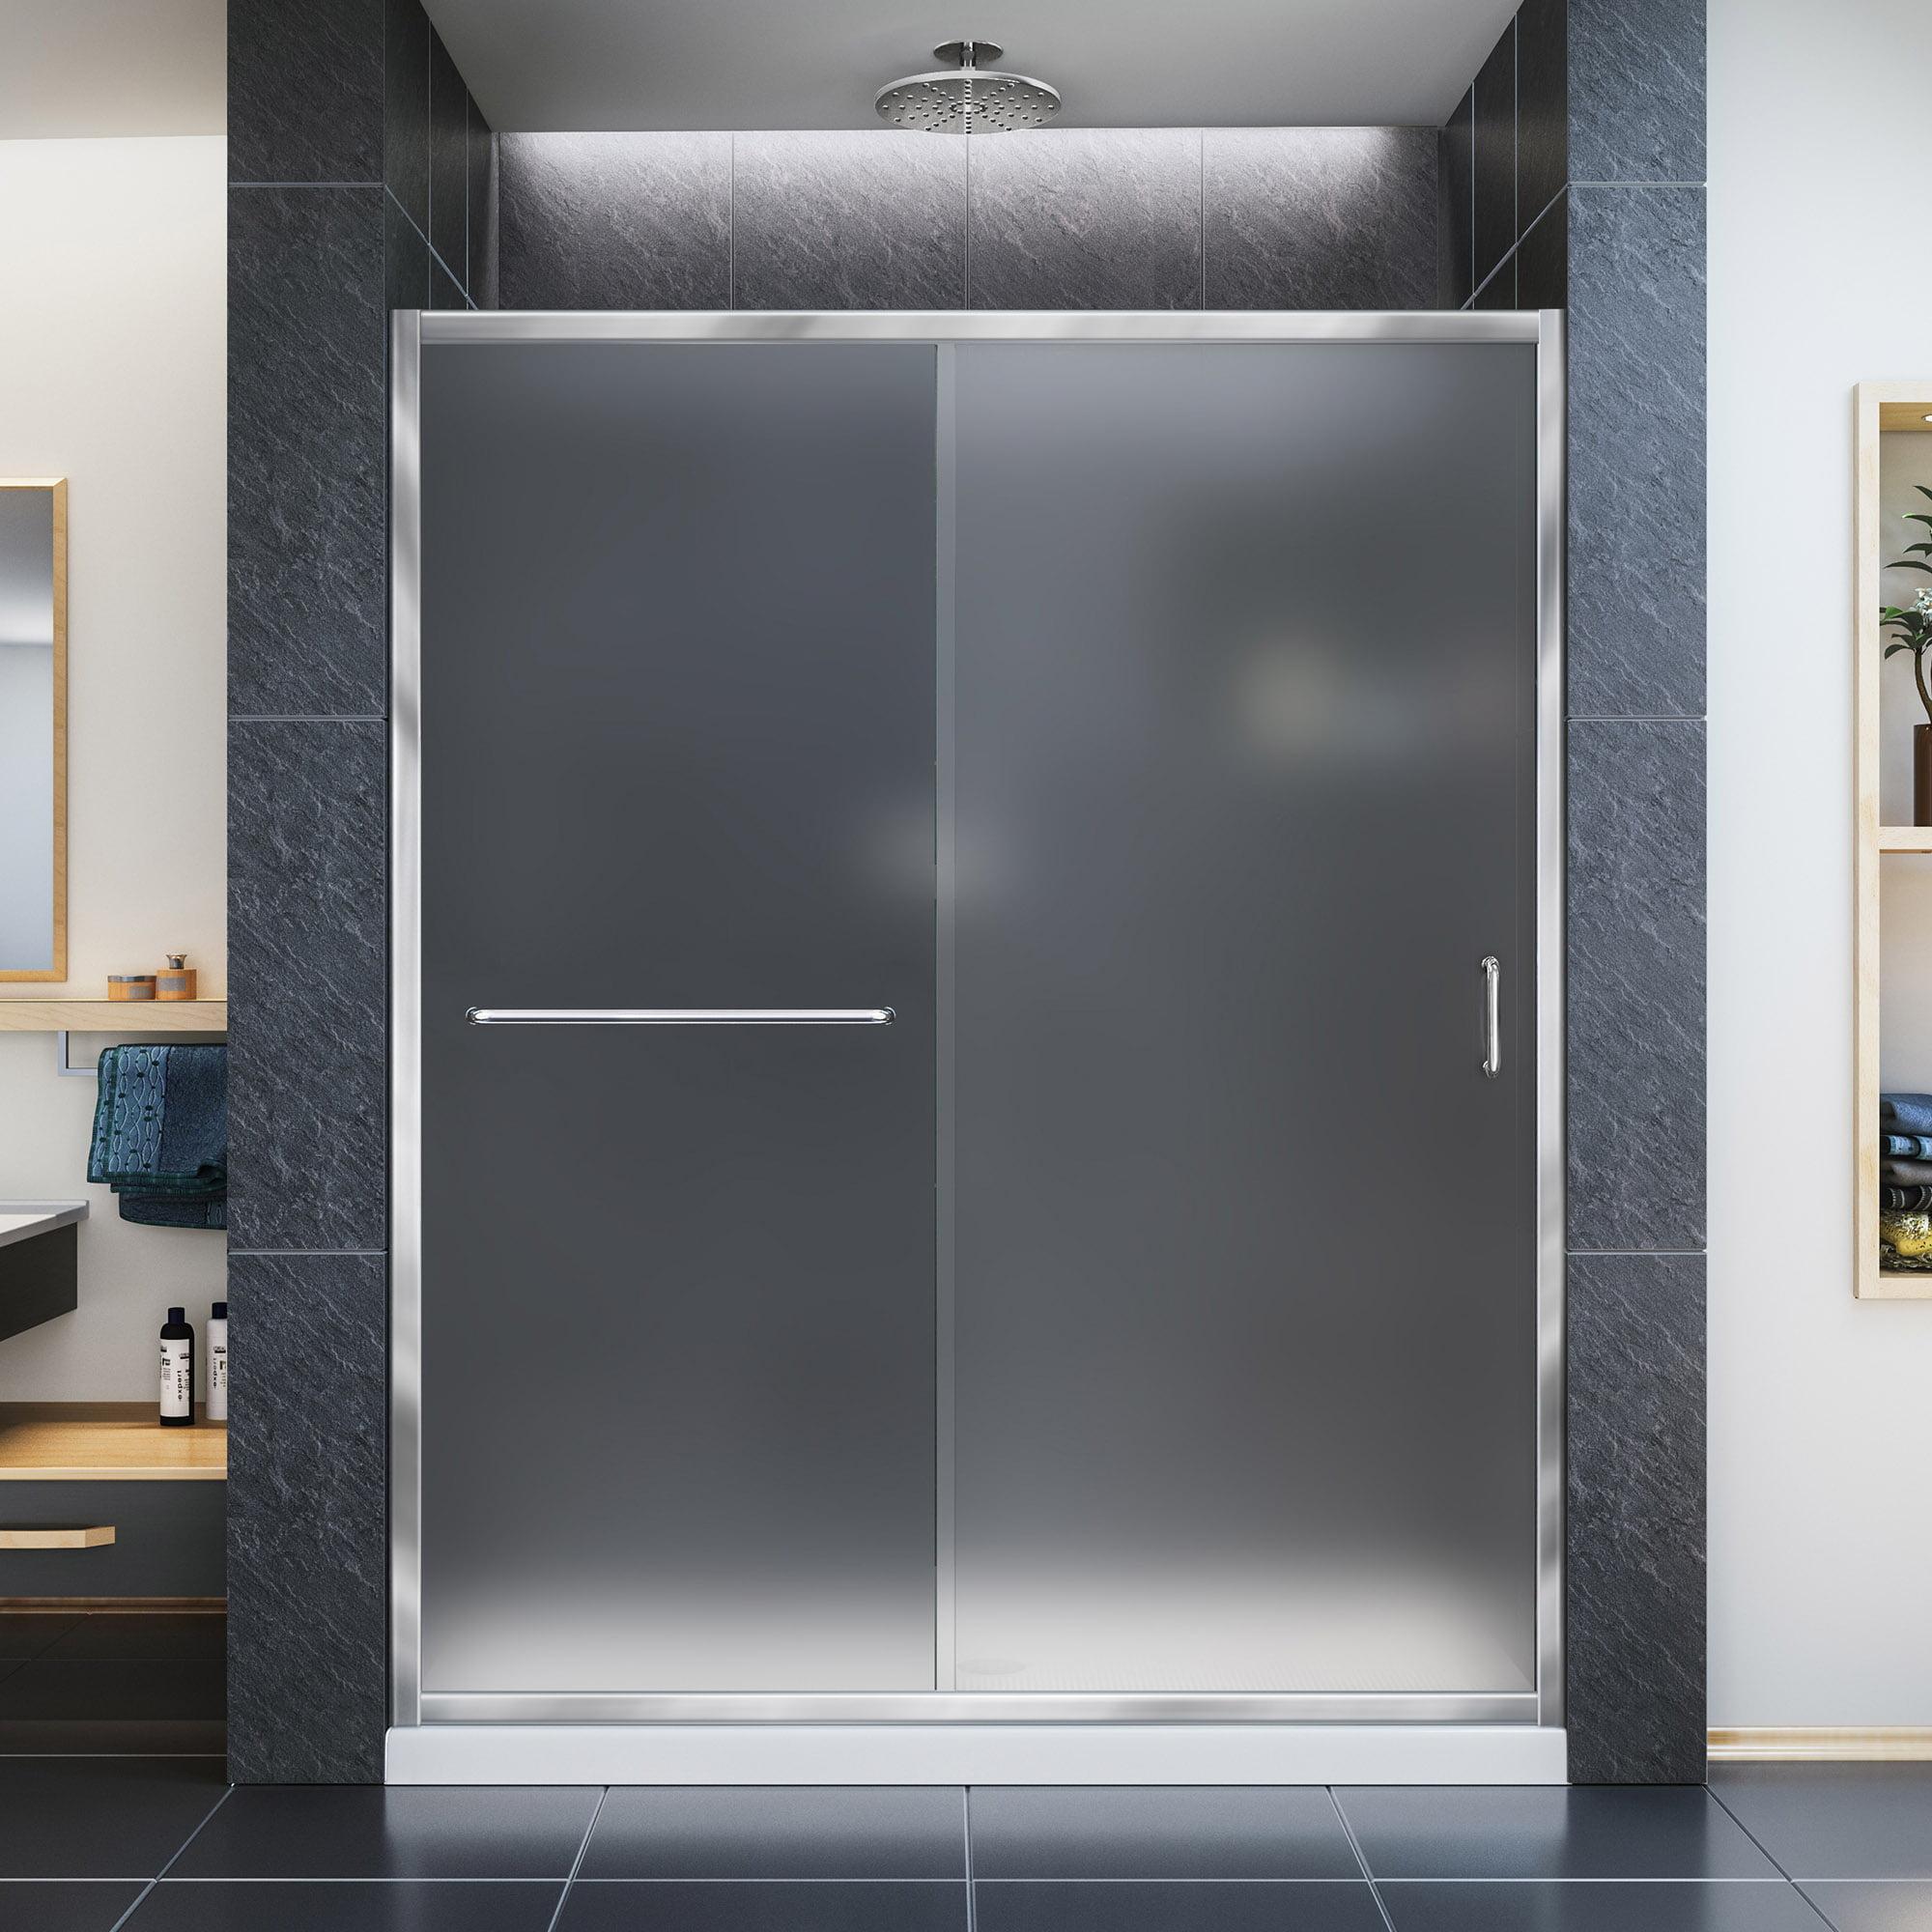 DreamLine Infinity-Z 50-54 in. W x 72 in. H Semi-Frameless Sliding Shower Door, Frosted Glass in Chrome